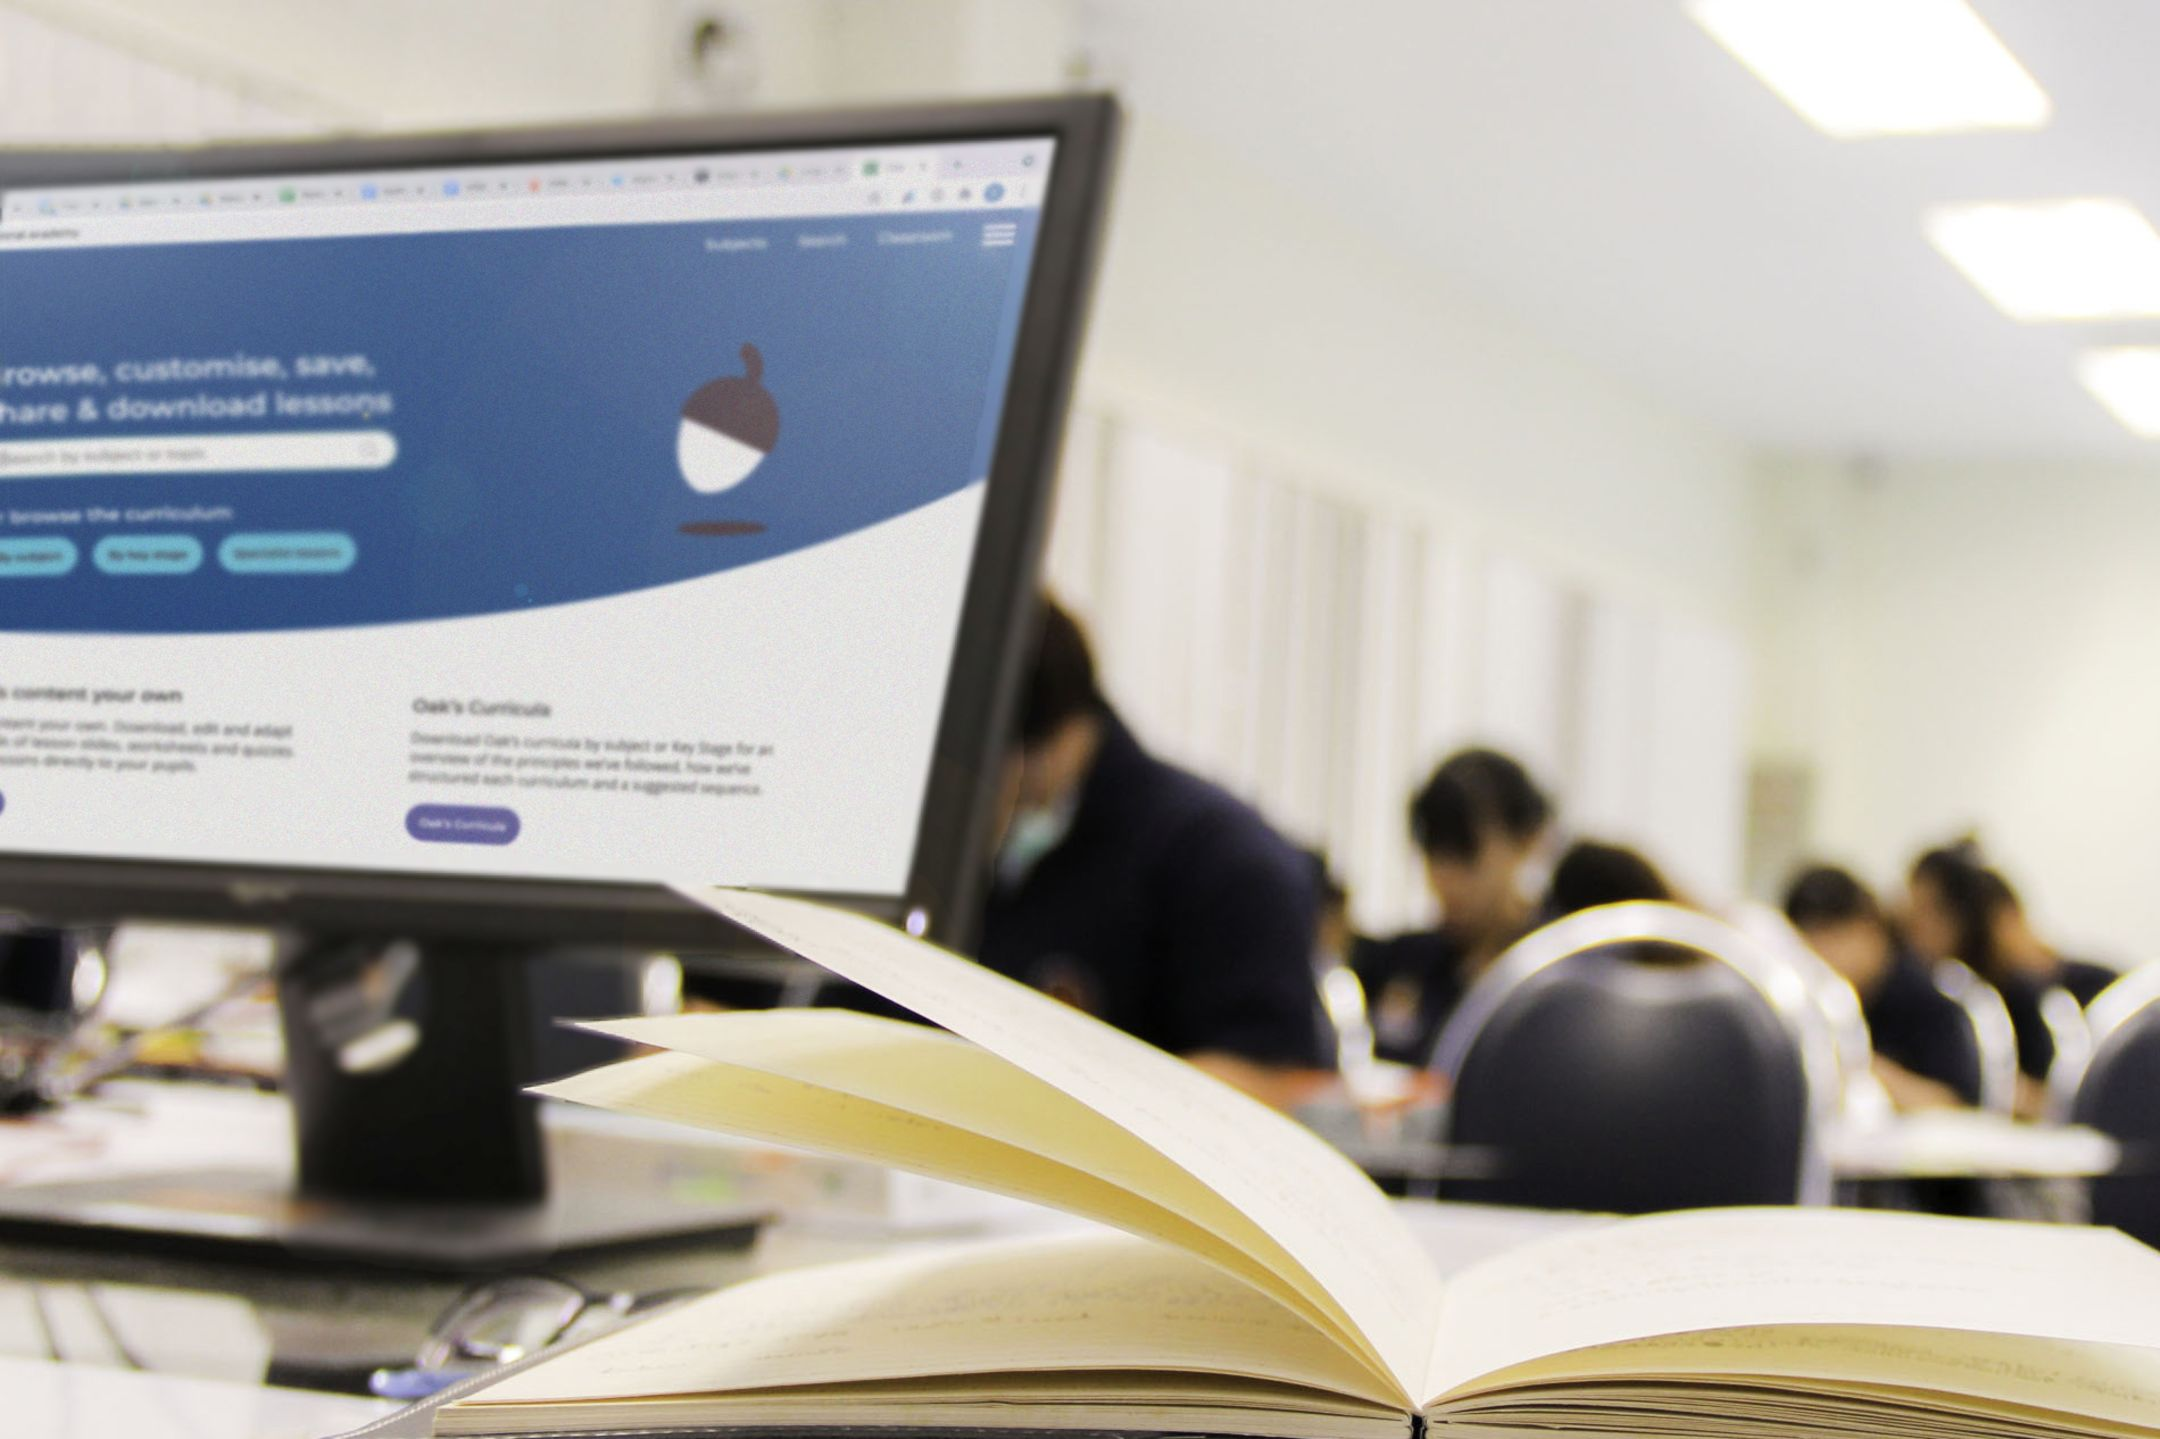 An Oak lesson showing on a teacher's screen in a classroom